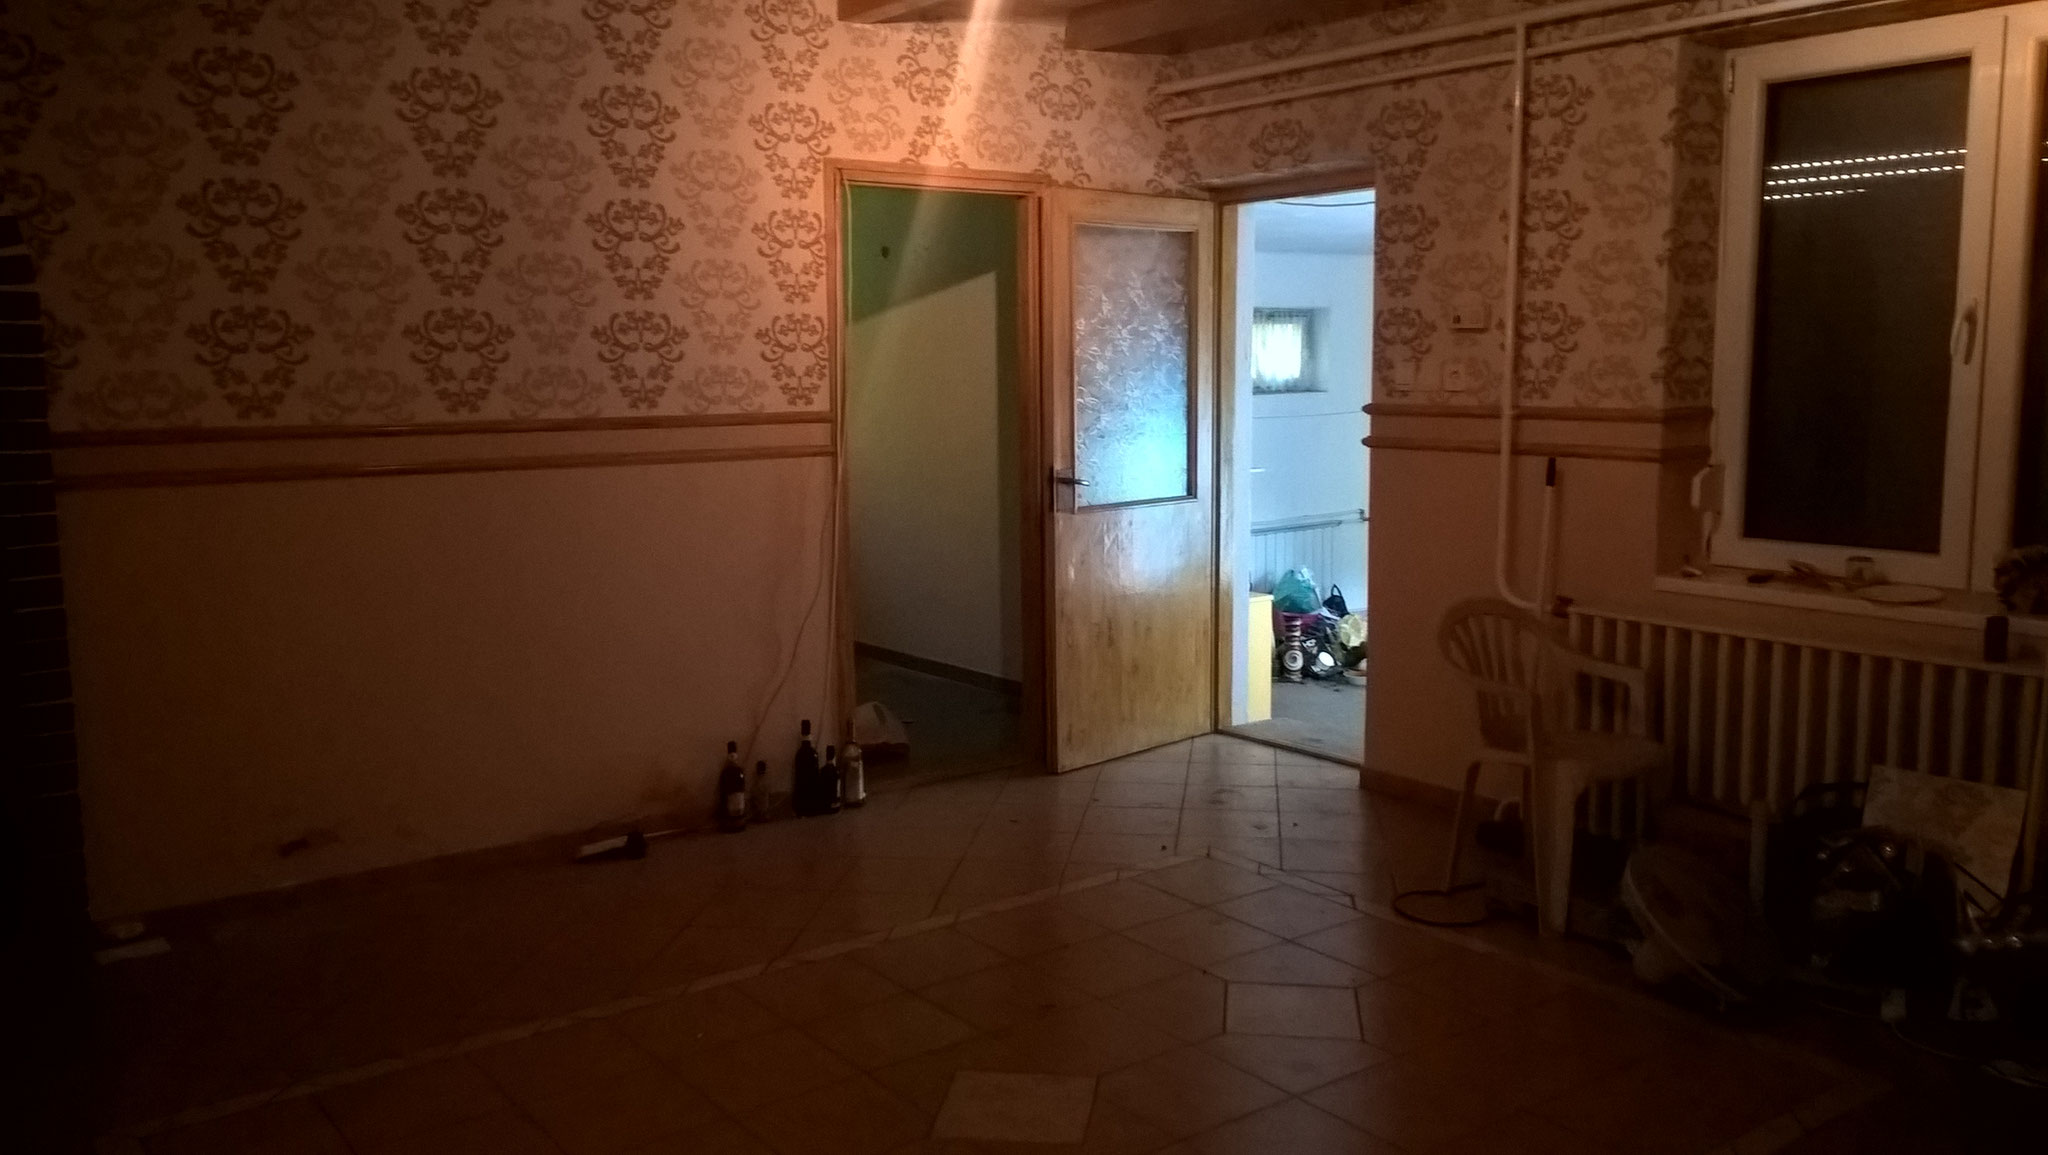 angebot 2 - tanya akácos - ungarn-immobilien-hw, Badezimmer ideen